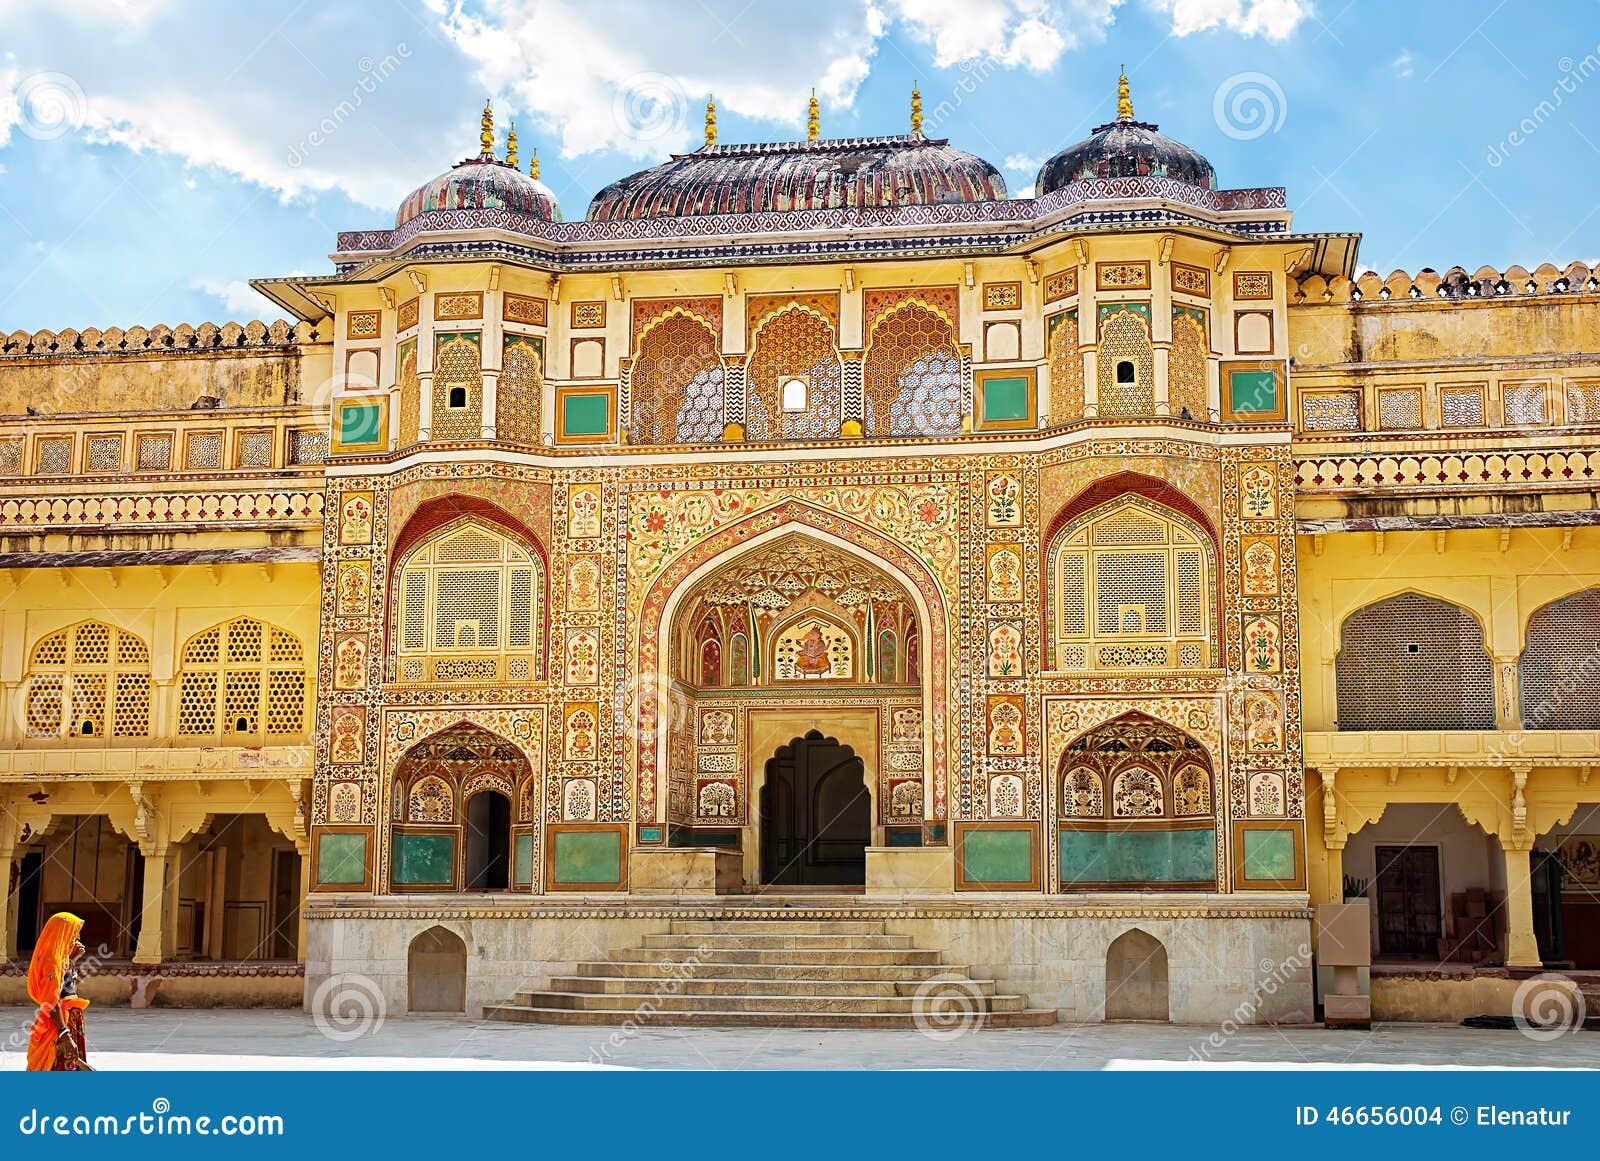 Gul dekorerad detaljfortnyckel india jaipur gul fort india jaipur